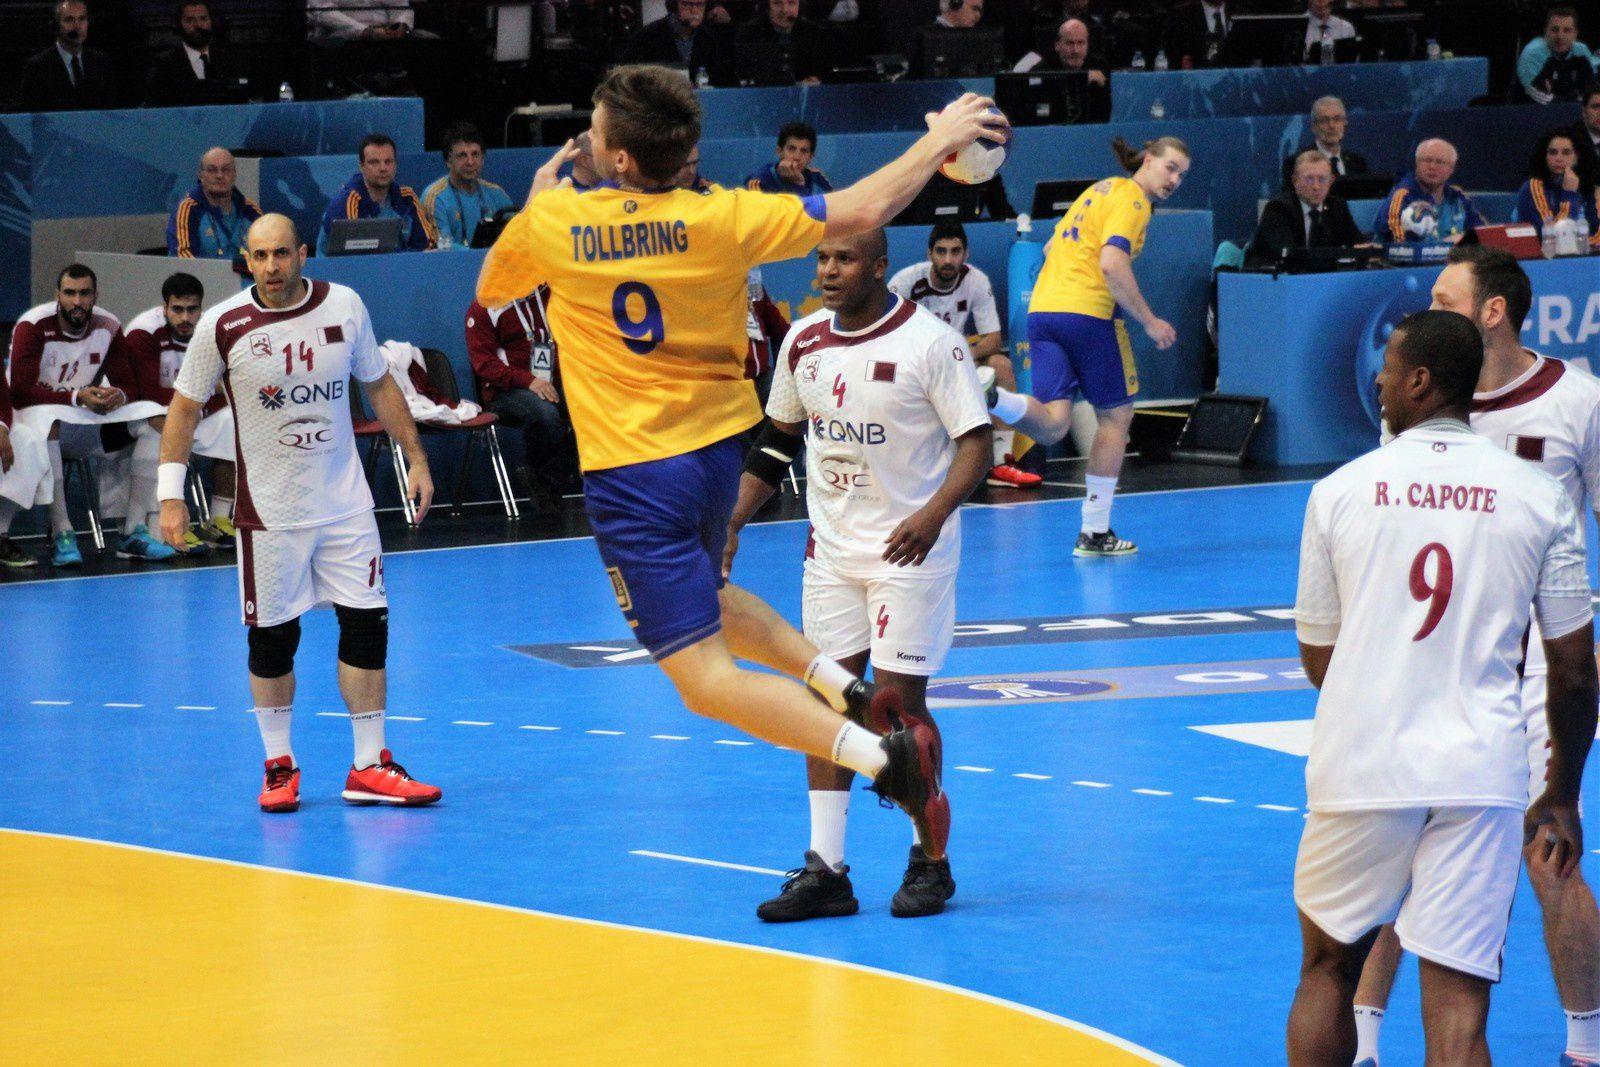 Suède vs Qatar (Championnat du Monde 2017) 18.01.2017